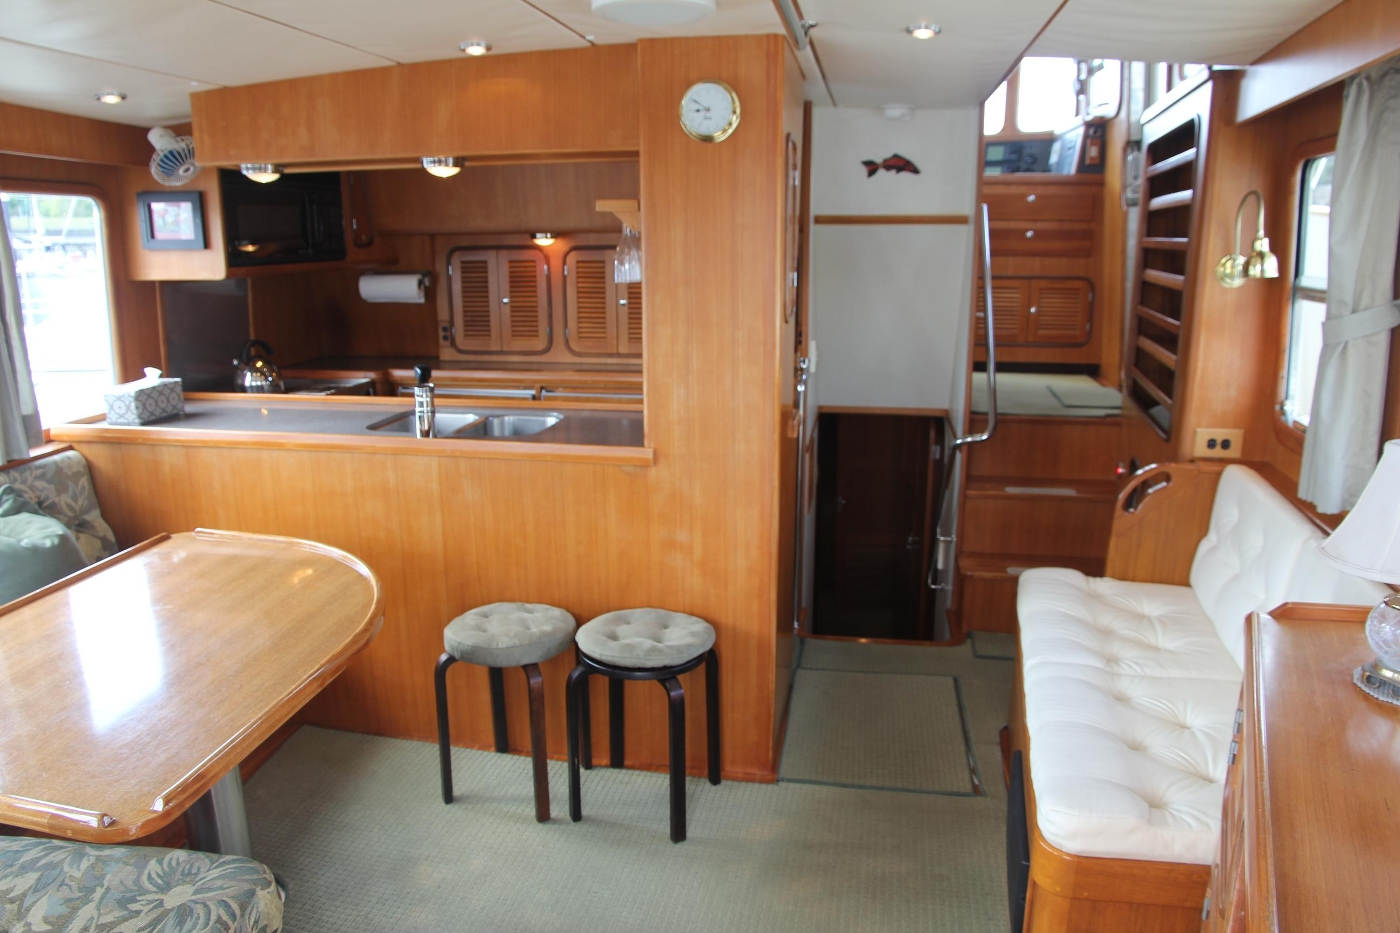 2000 Nordhavn Pilothouse, Salon Looking Forward